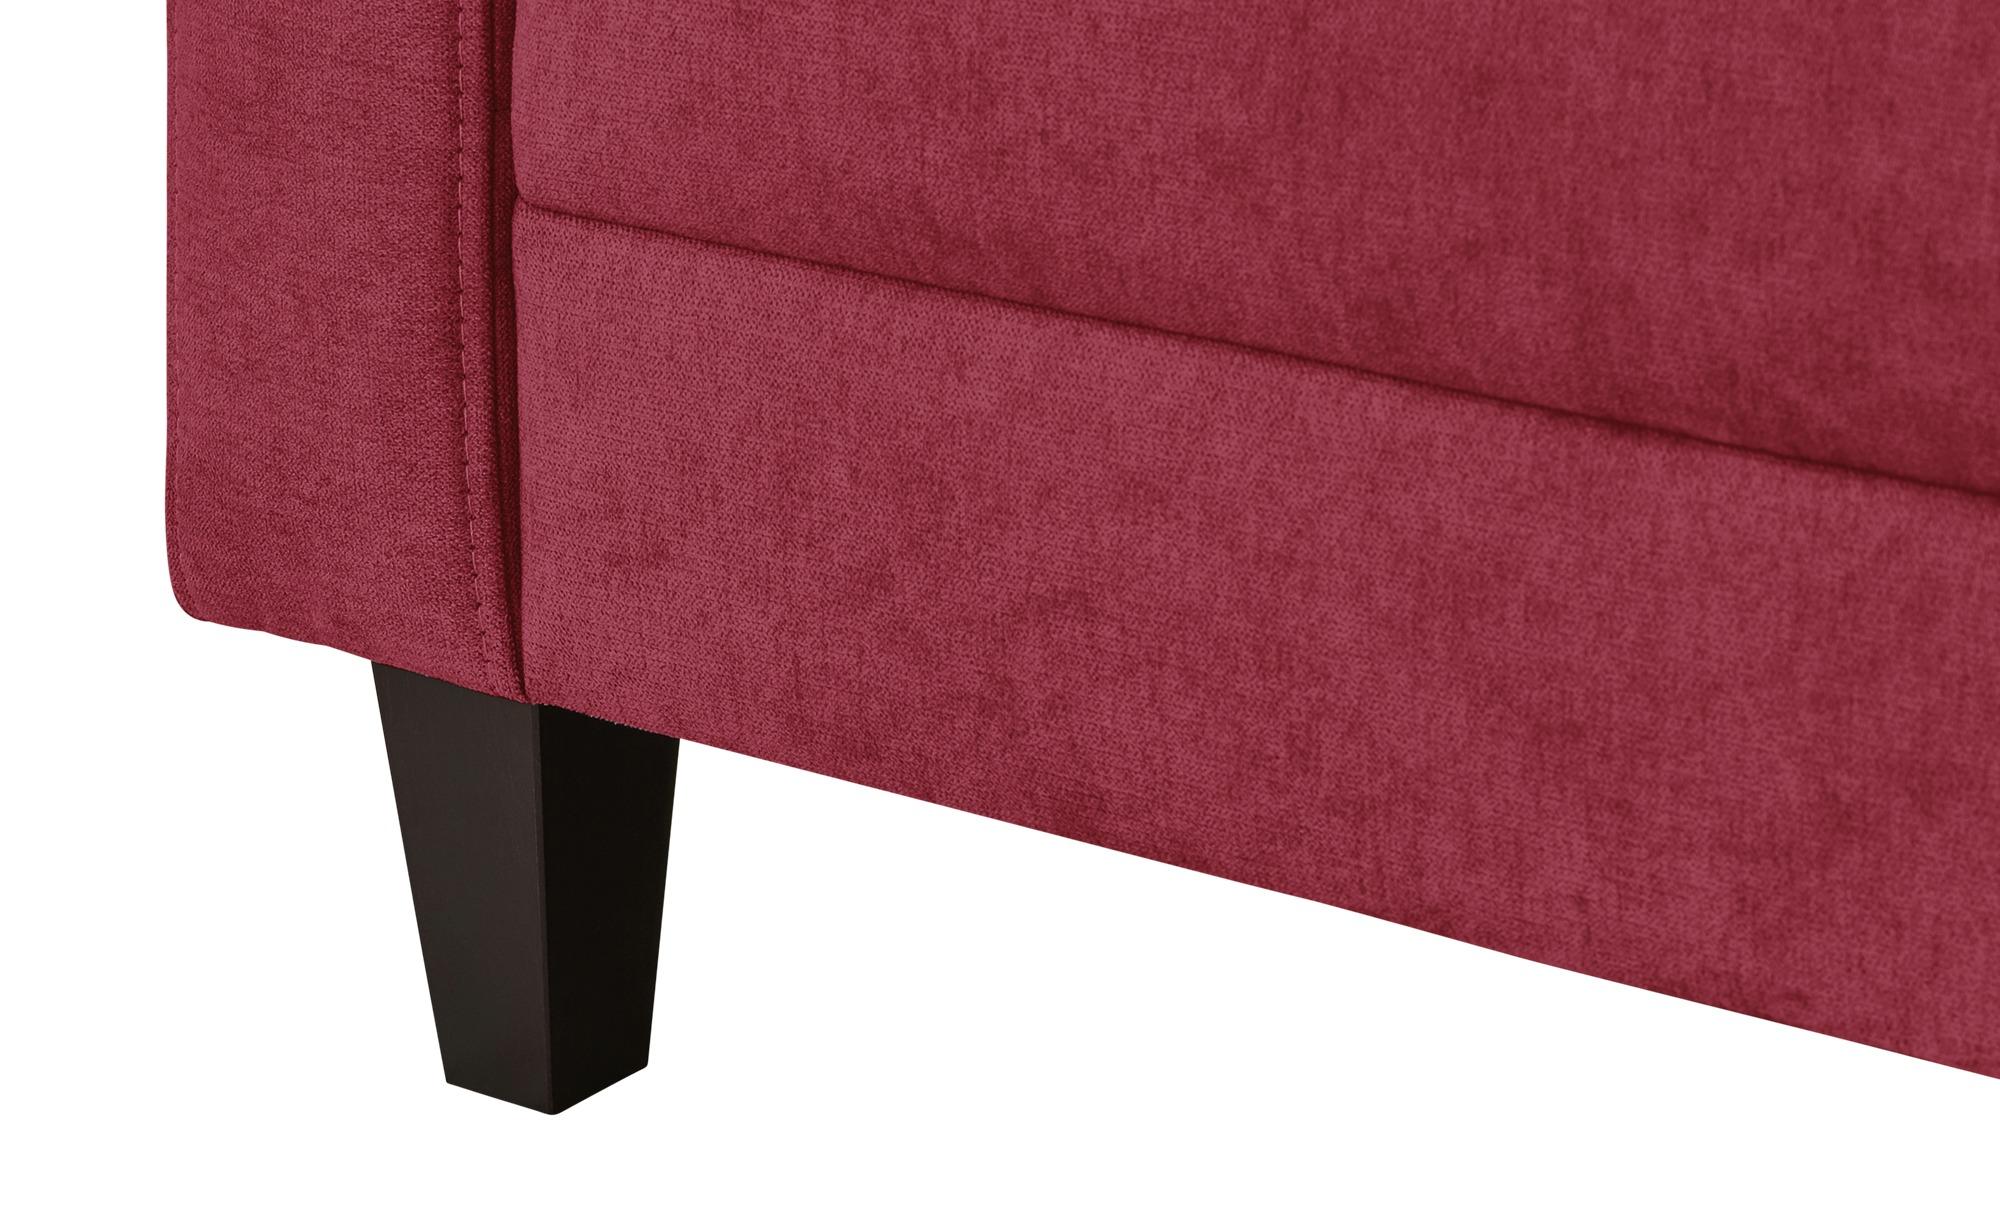 smart Sofa rot - Flachgewebe Geradine ¦ rot ¦ Maße (cm): B: 228 H: 83 T: 91 Polstermöbel > Sofas > 3-Sitzer - Höffner